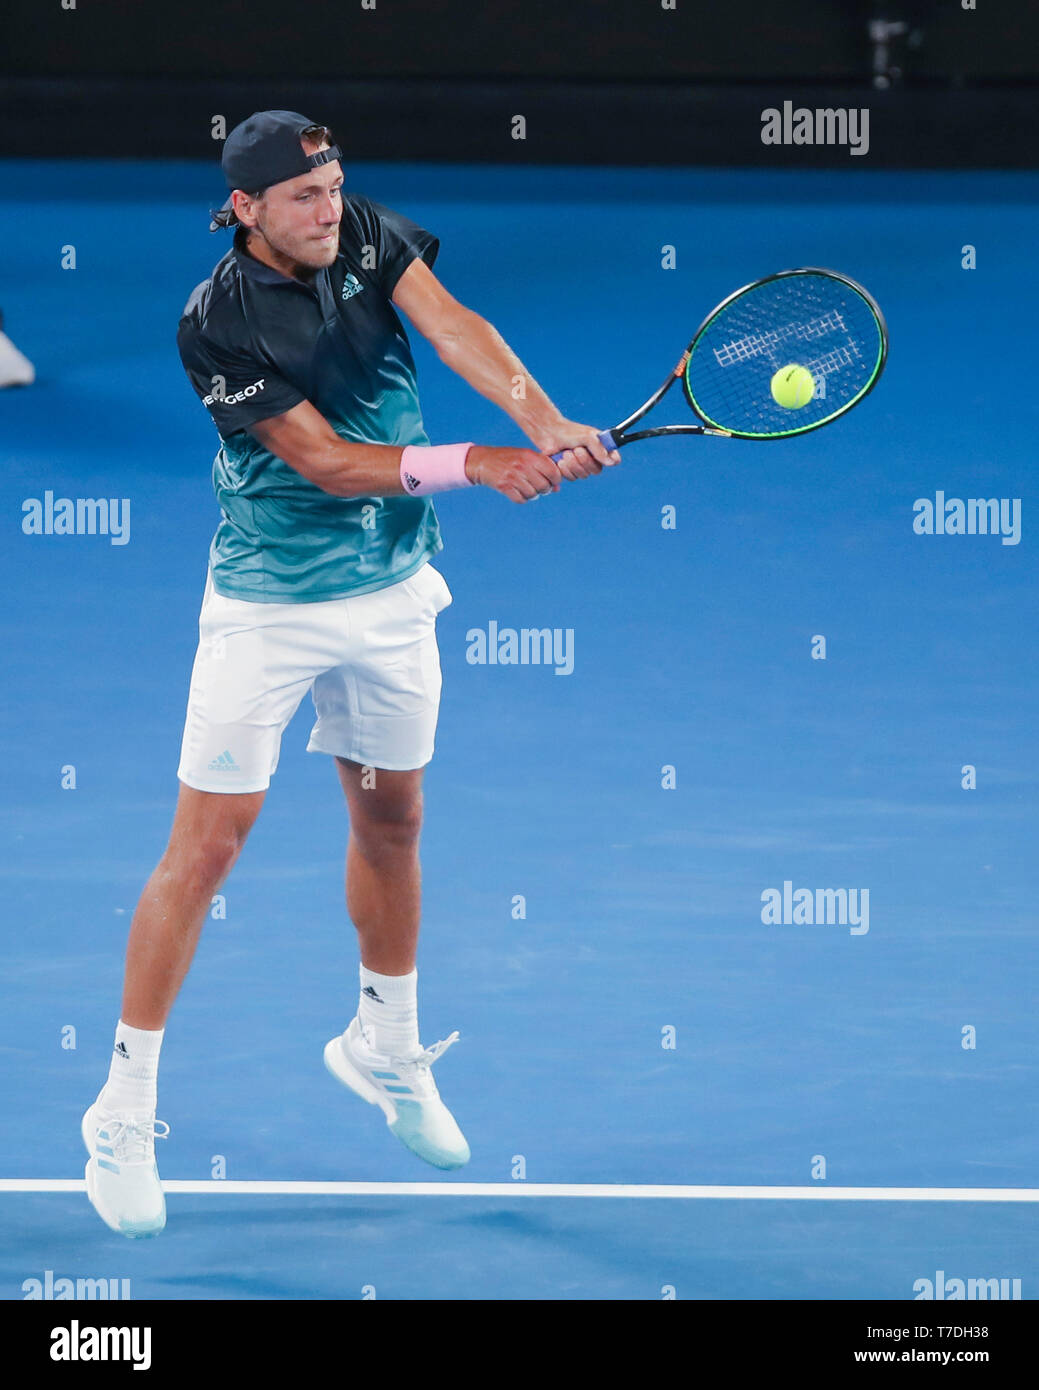 French tennis player Lucas Pouille playing backhand shot in Australian Open 2019 tennis tournament, Melbourne Park, Melbourne, Victoria, Australia - Stock Image